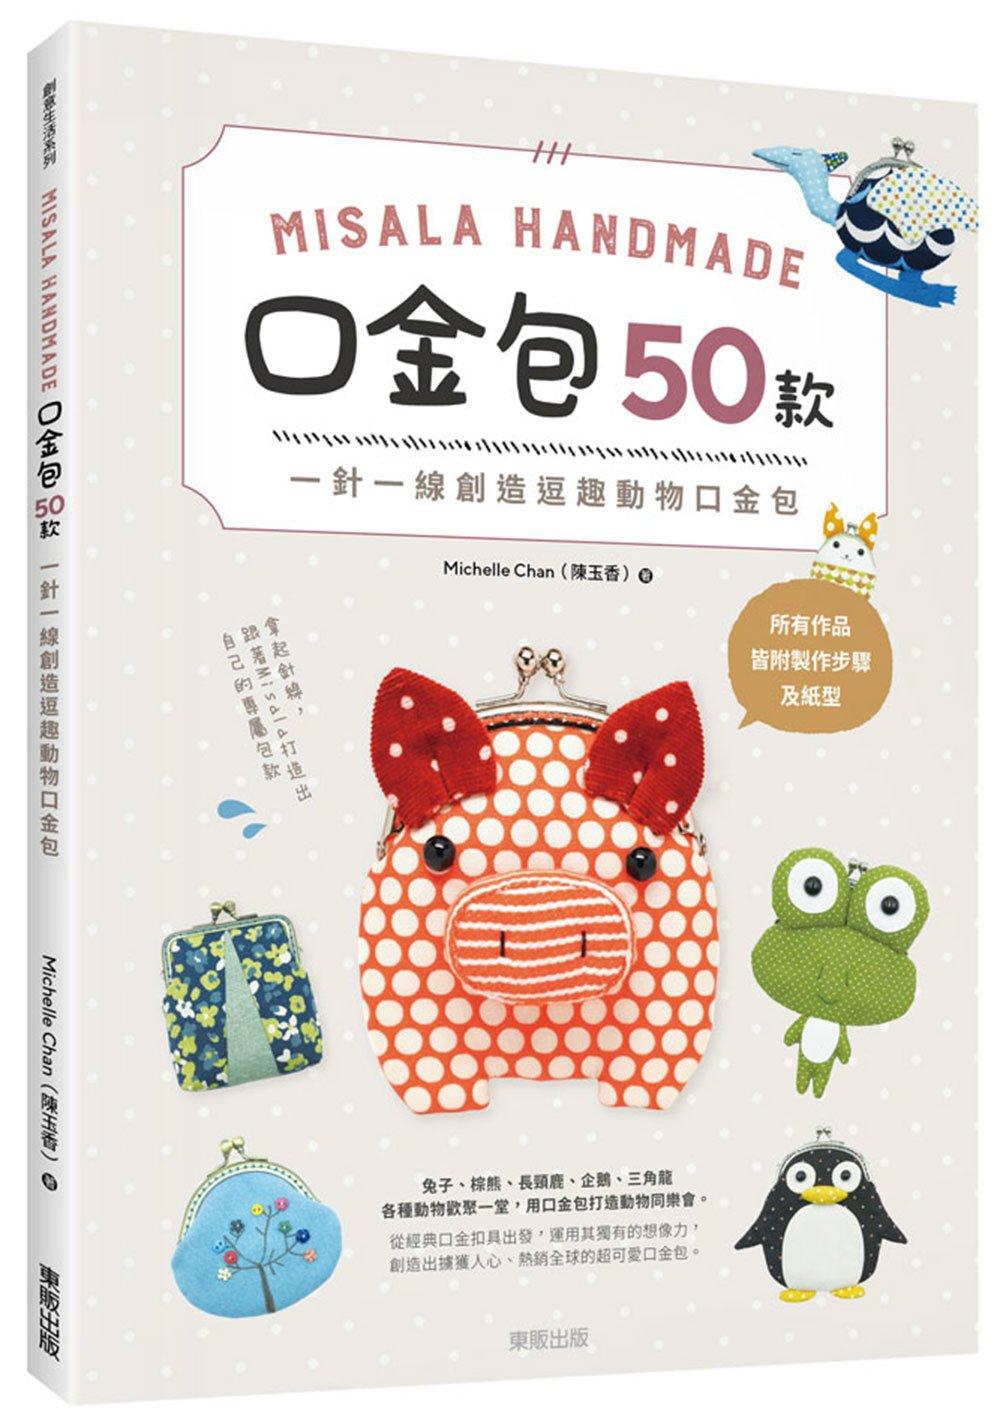 Misala Handmade 口金包50款:一針一線創造逗趣動物口金包